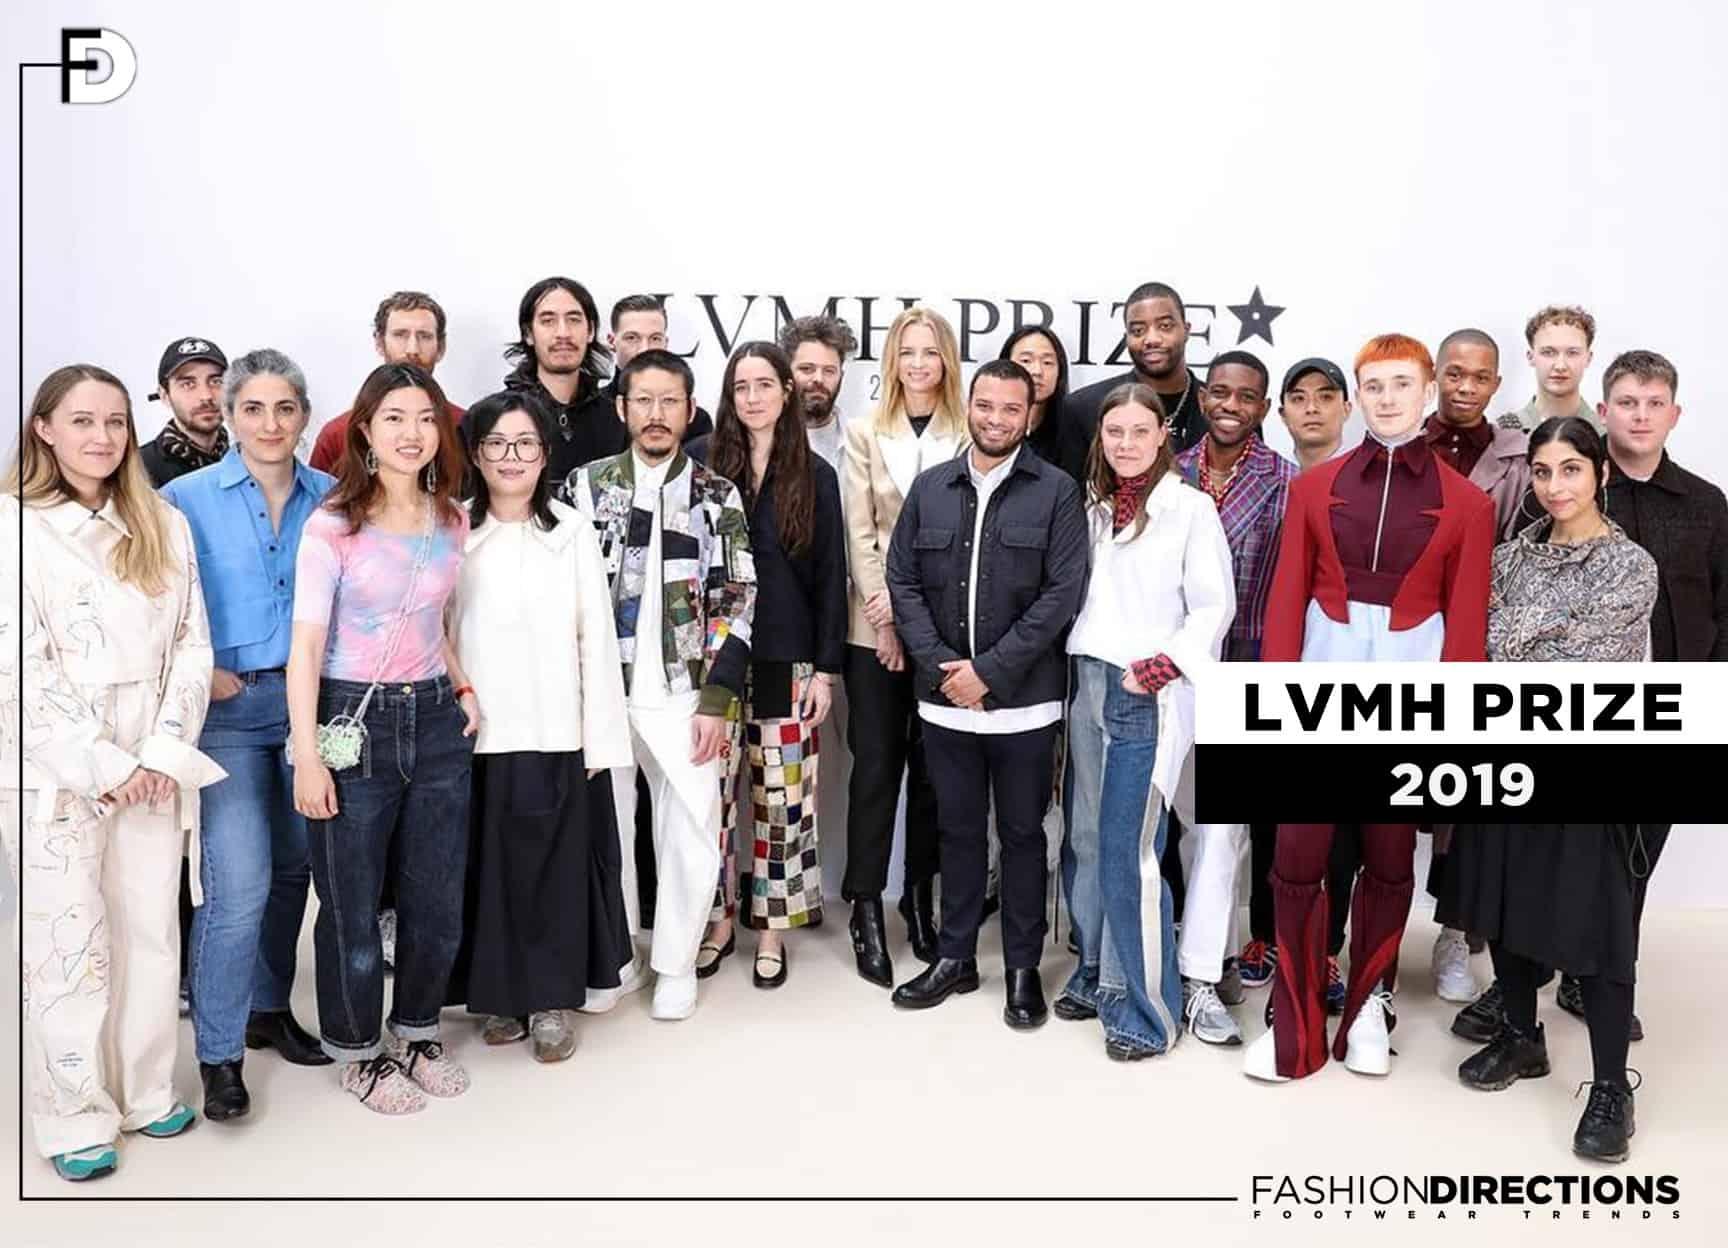 LVMH PRIZE 2019 1